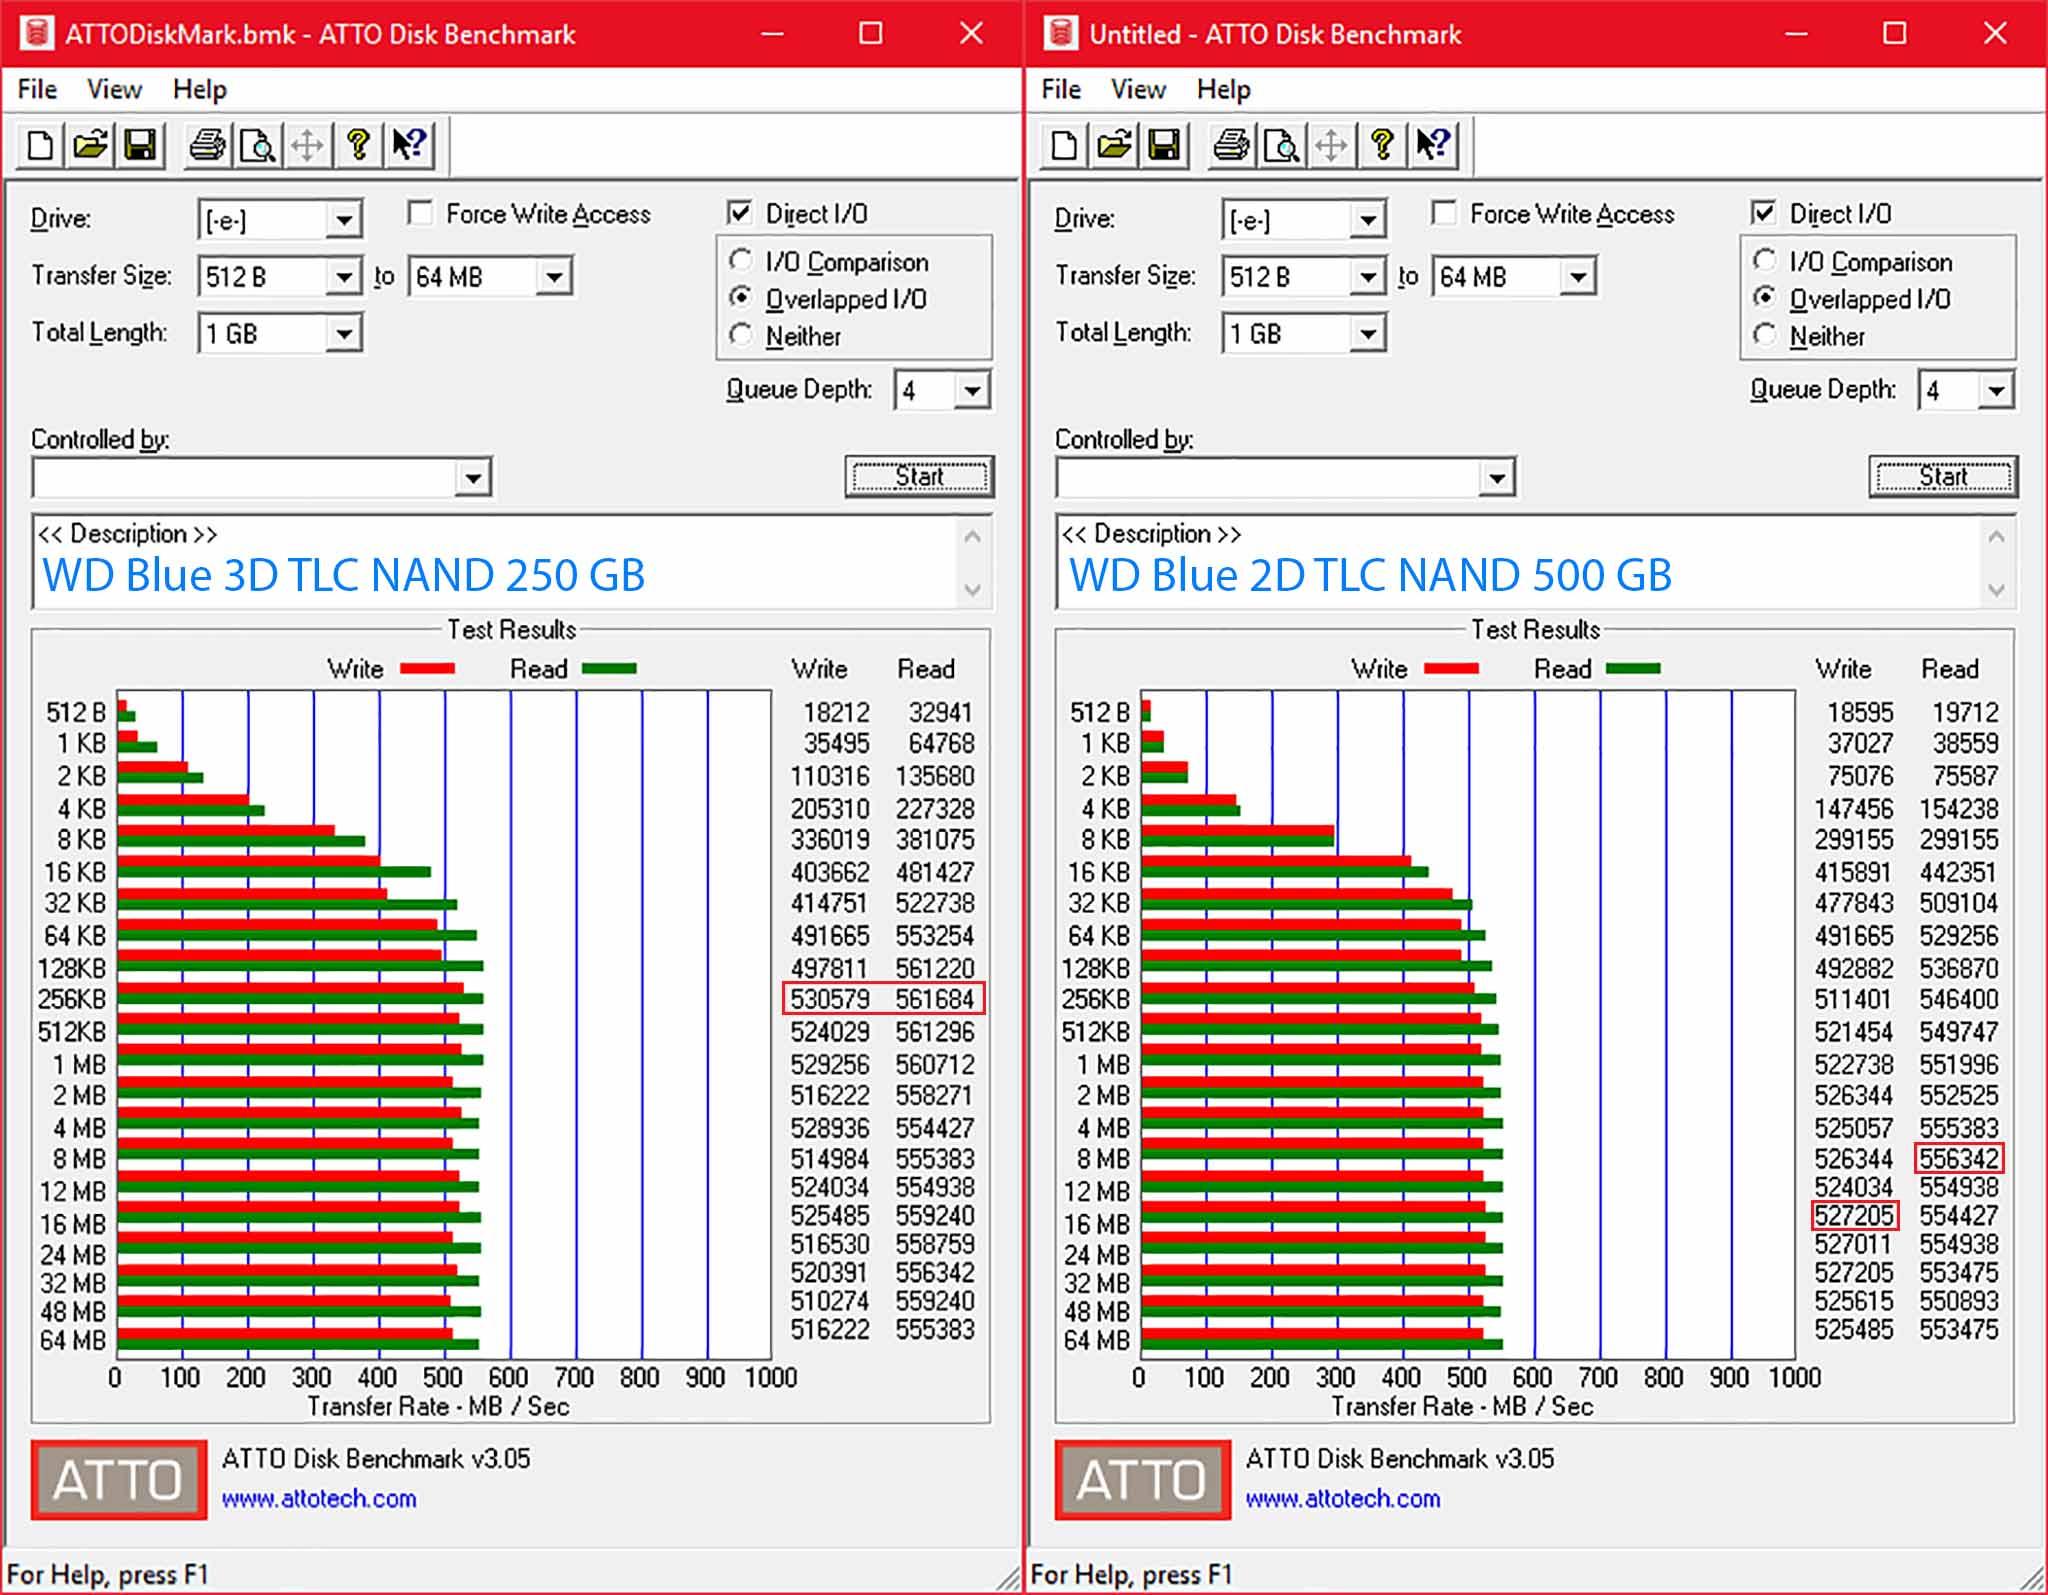 ATTODisk WD Blue SSD So sánh.jpg